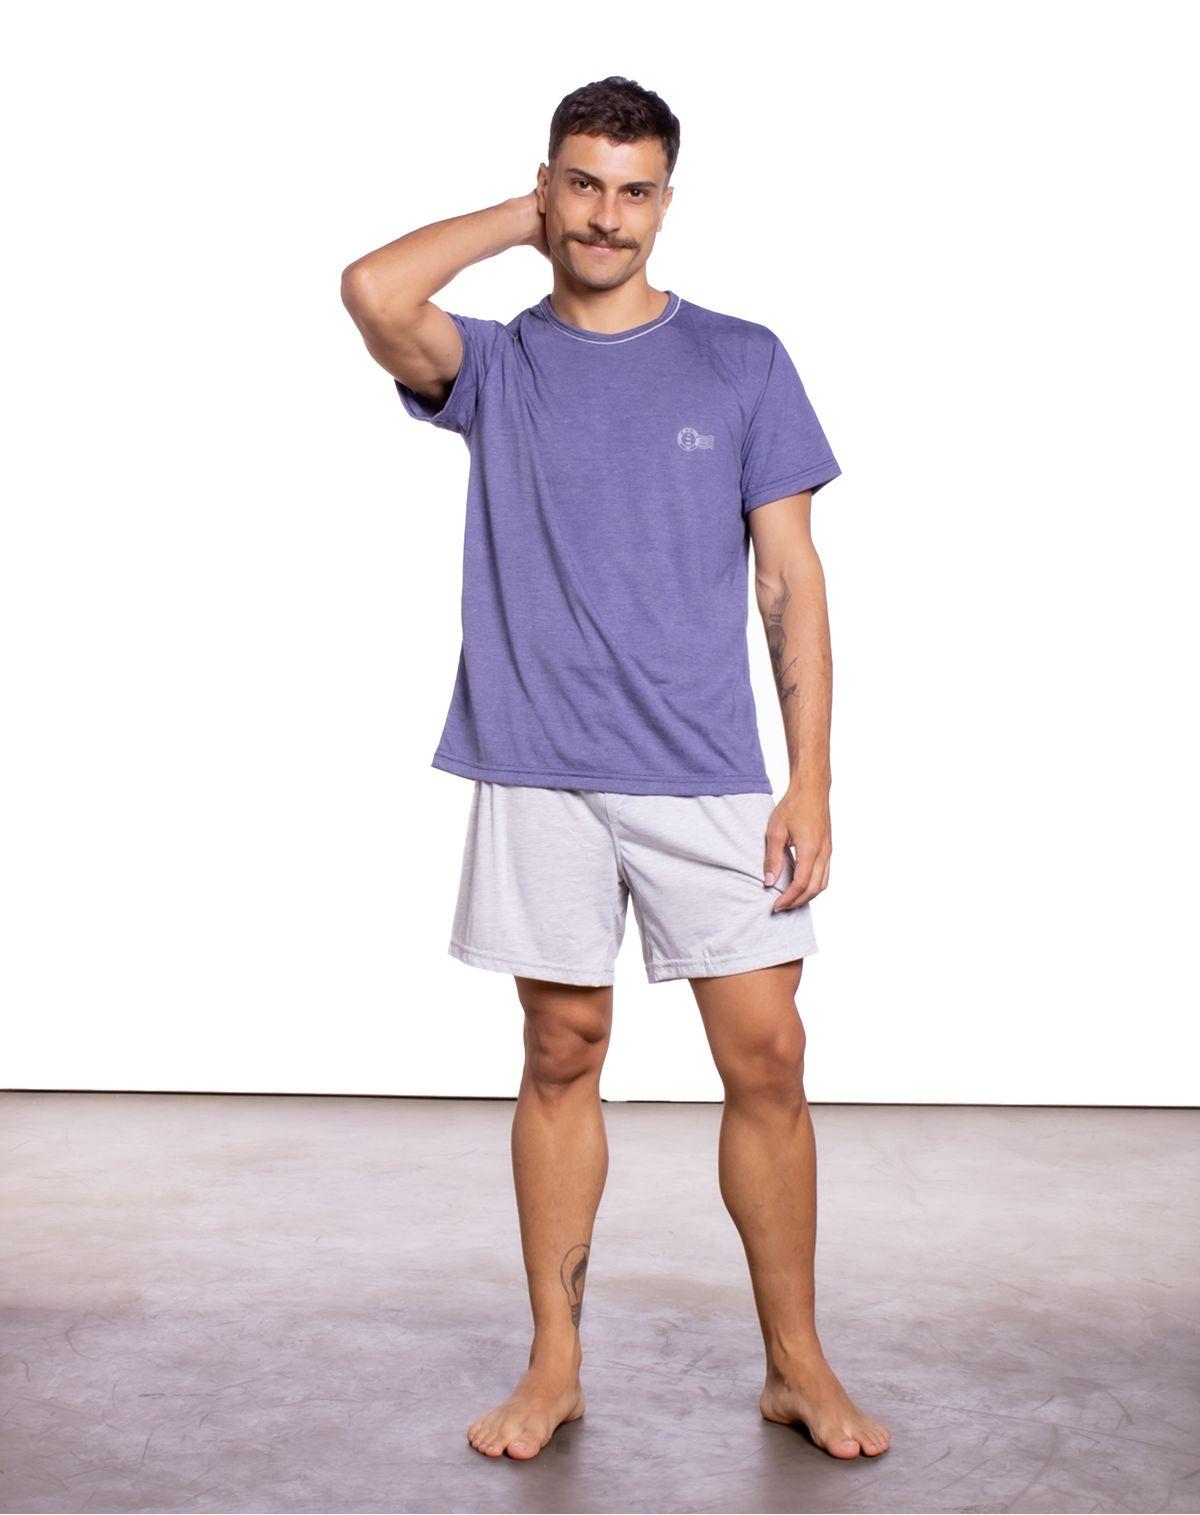 567989003-pijama-curto-liso-masculino-marinho-g-869